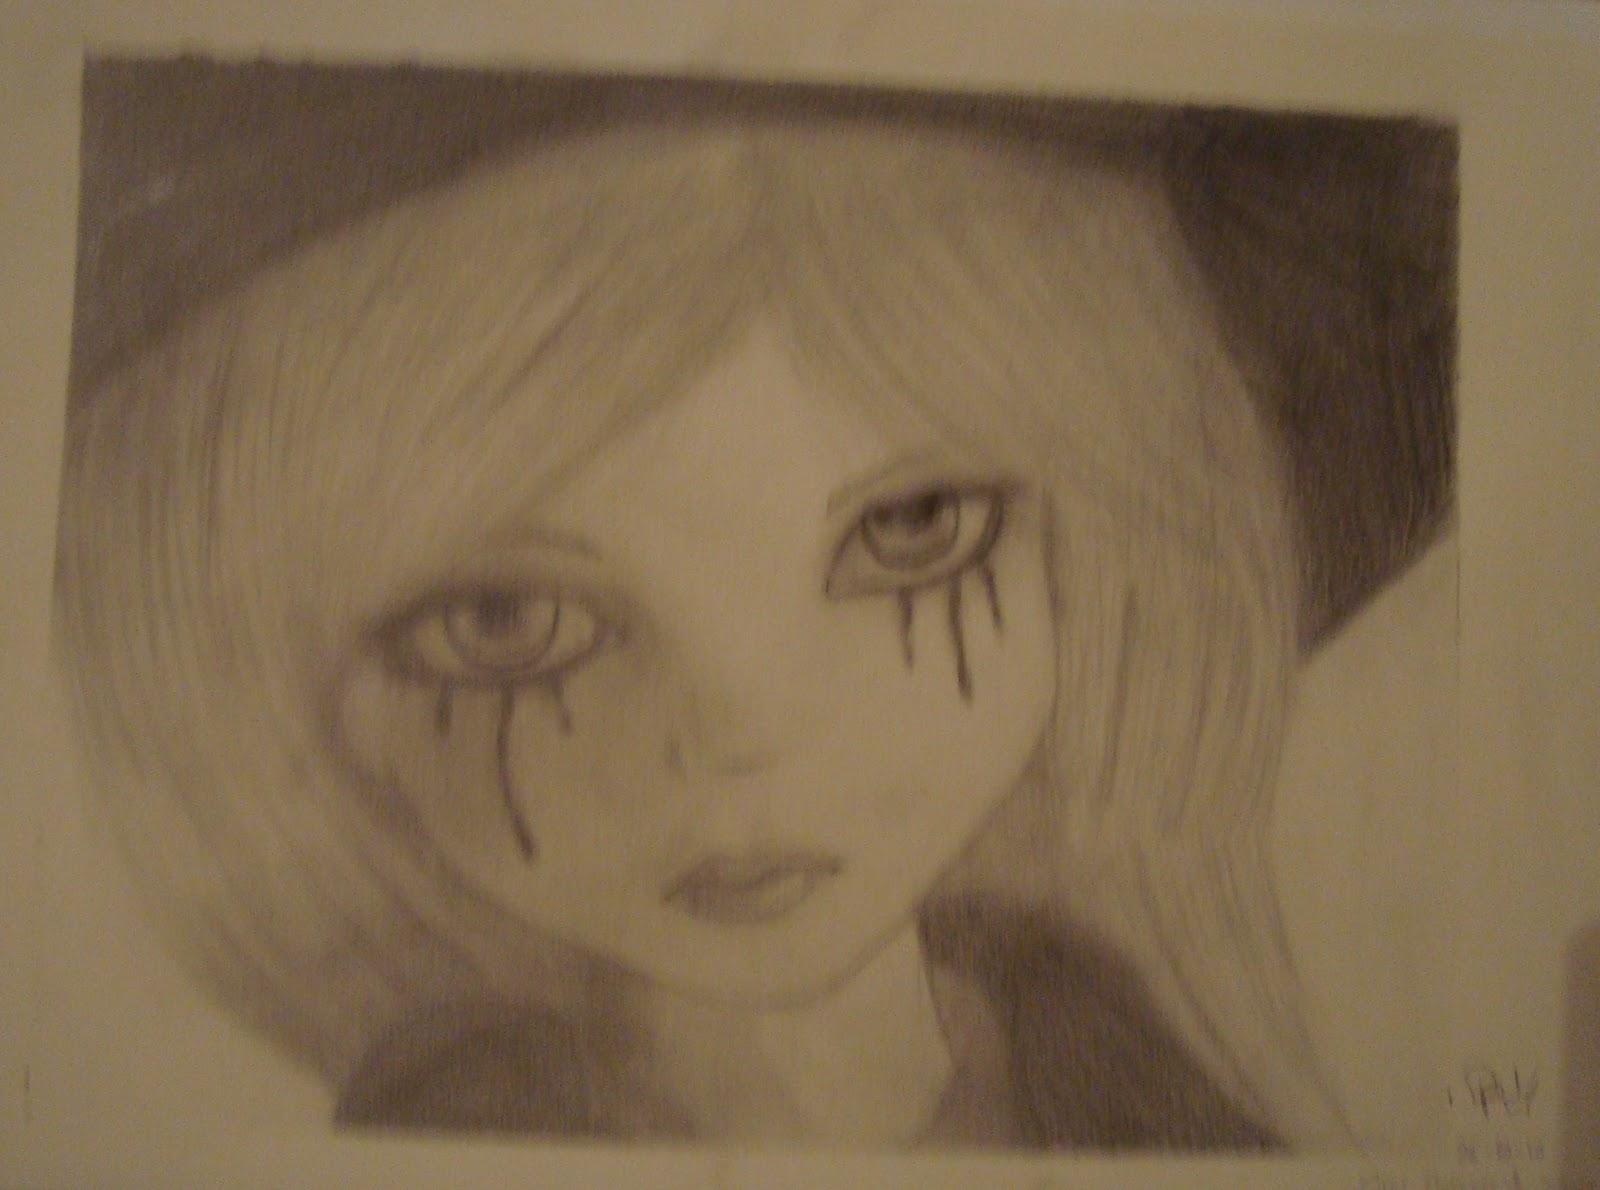 http://4.bp.blogspot.com/_j-rPX-gvyVE/TMsIj_CvhHI/AAAAAAAAAJ8/RMdJX8l2yK4/s1600/ojos+llorosos+de+sangre+004.jpg